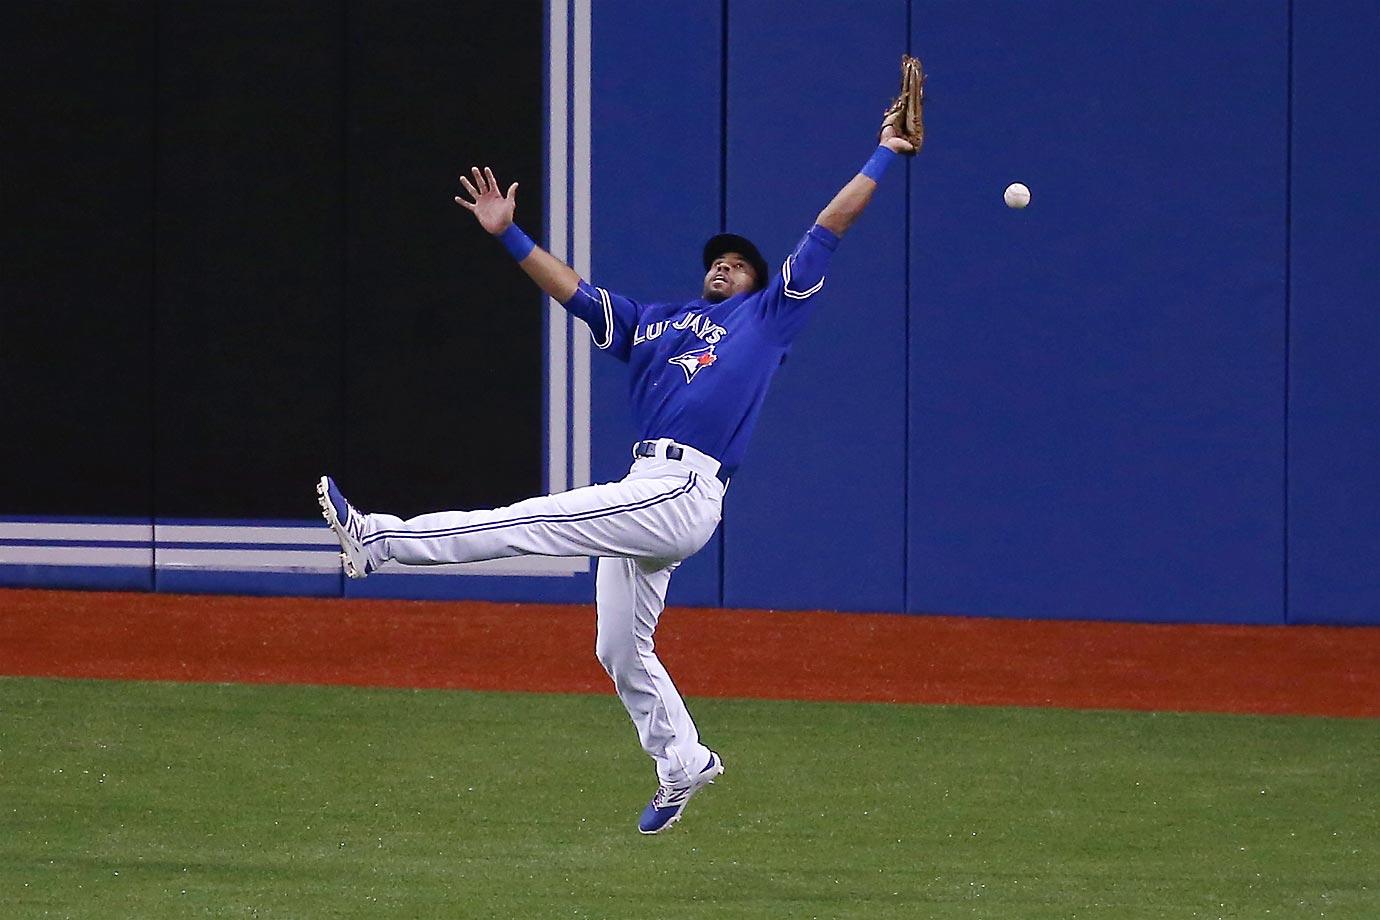 Dalton Pompey of the Toronto Blue Jays misplays a ball against the Atlanta Braves.